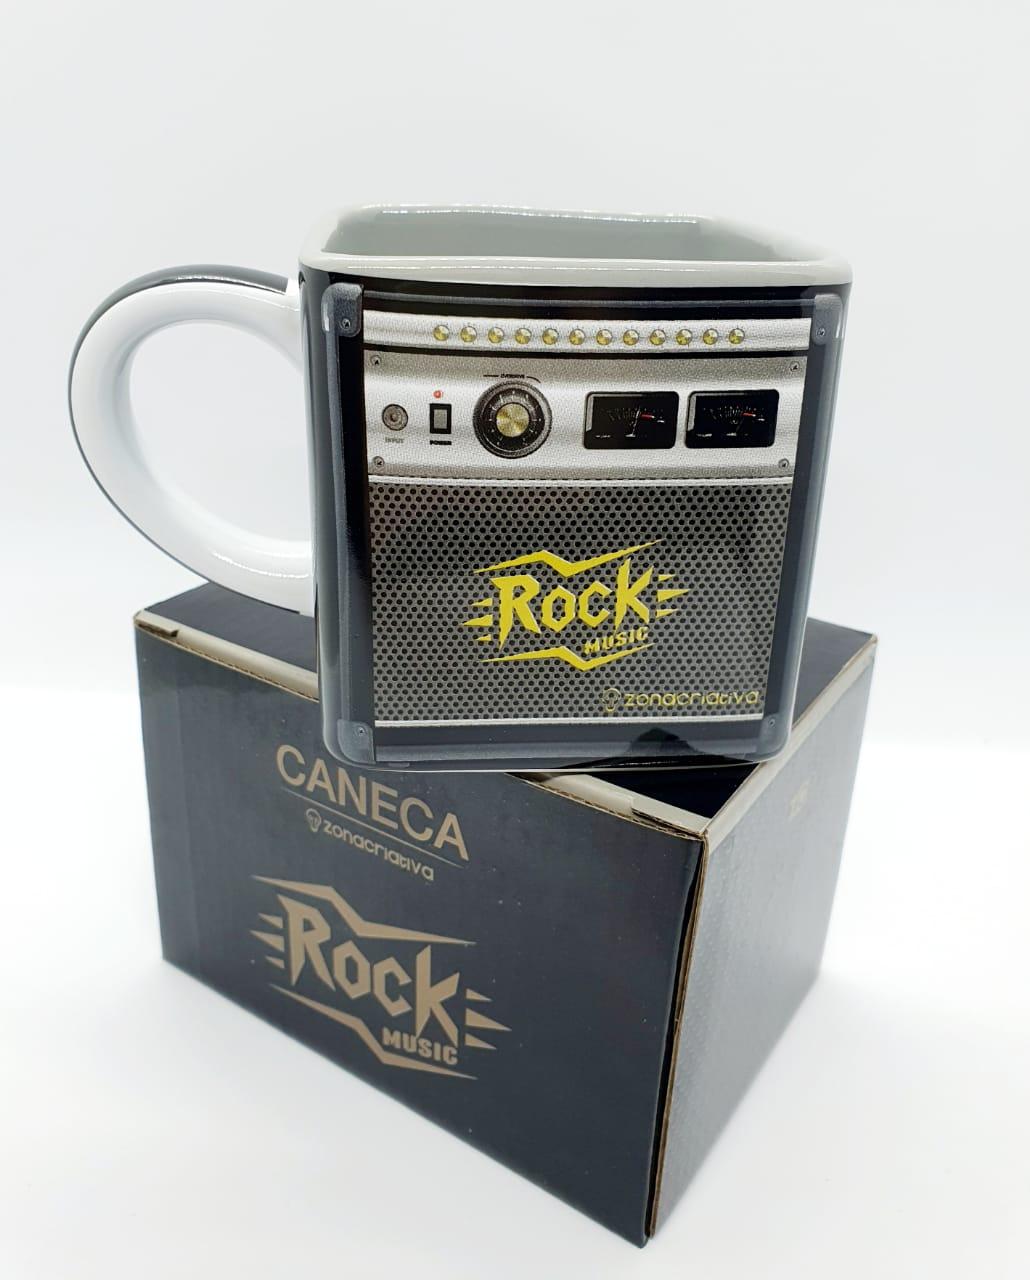 Caneca cubo 300ml - Rock music